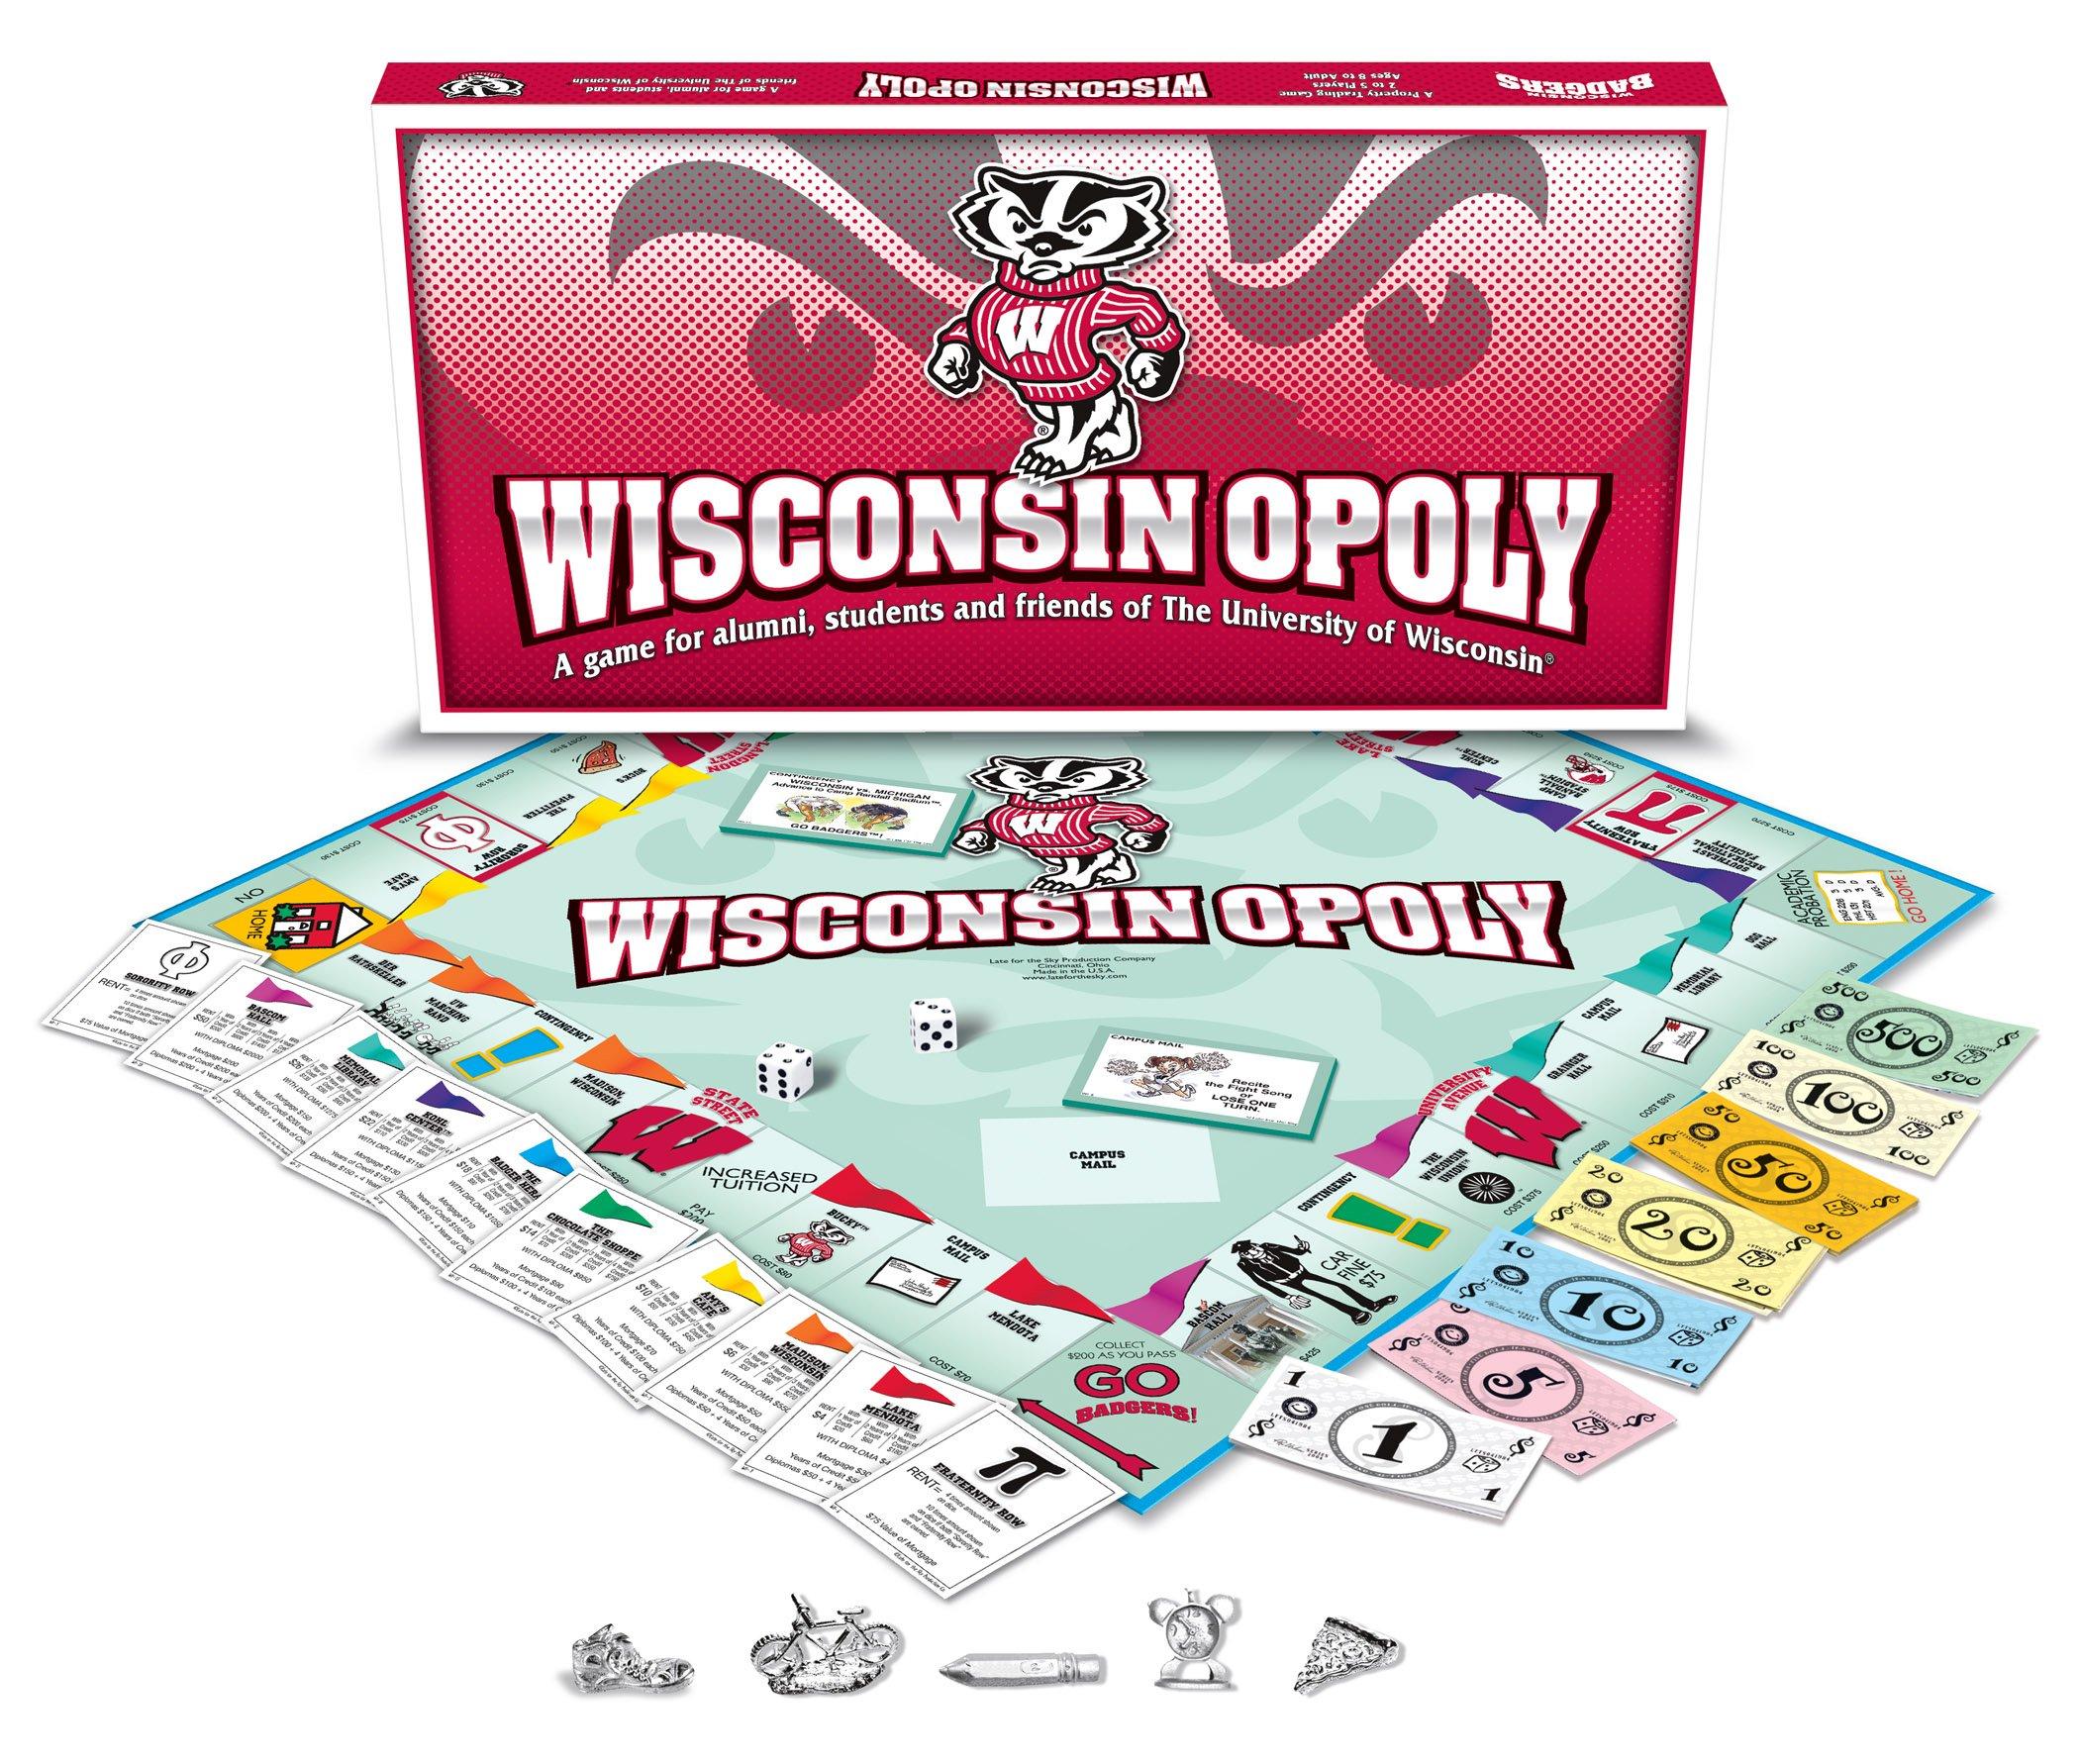 University of Wisconsin - Wisconsinopoly